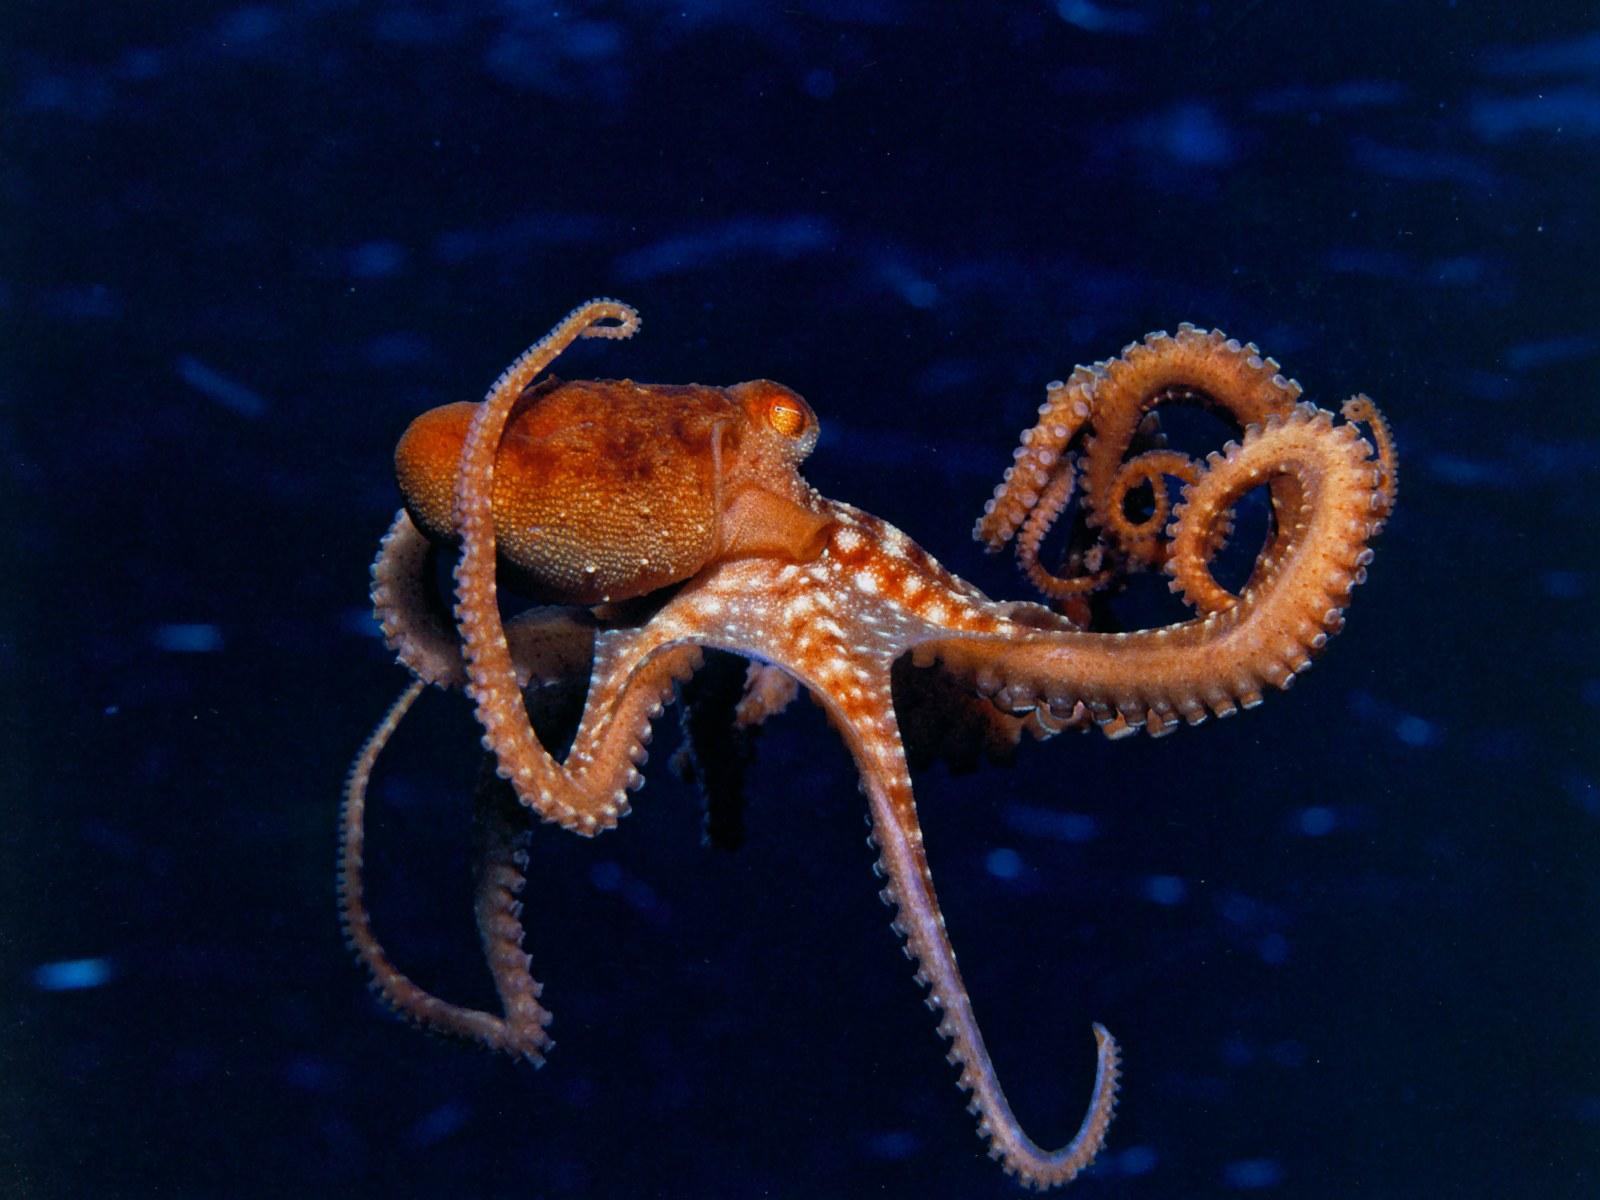 Octopus · Octopus · Octopus · Octopus ...